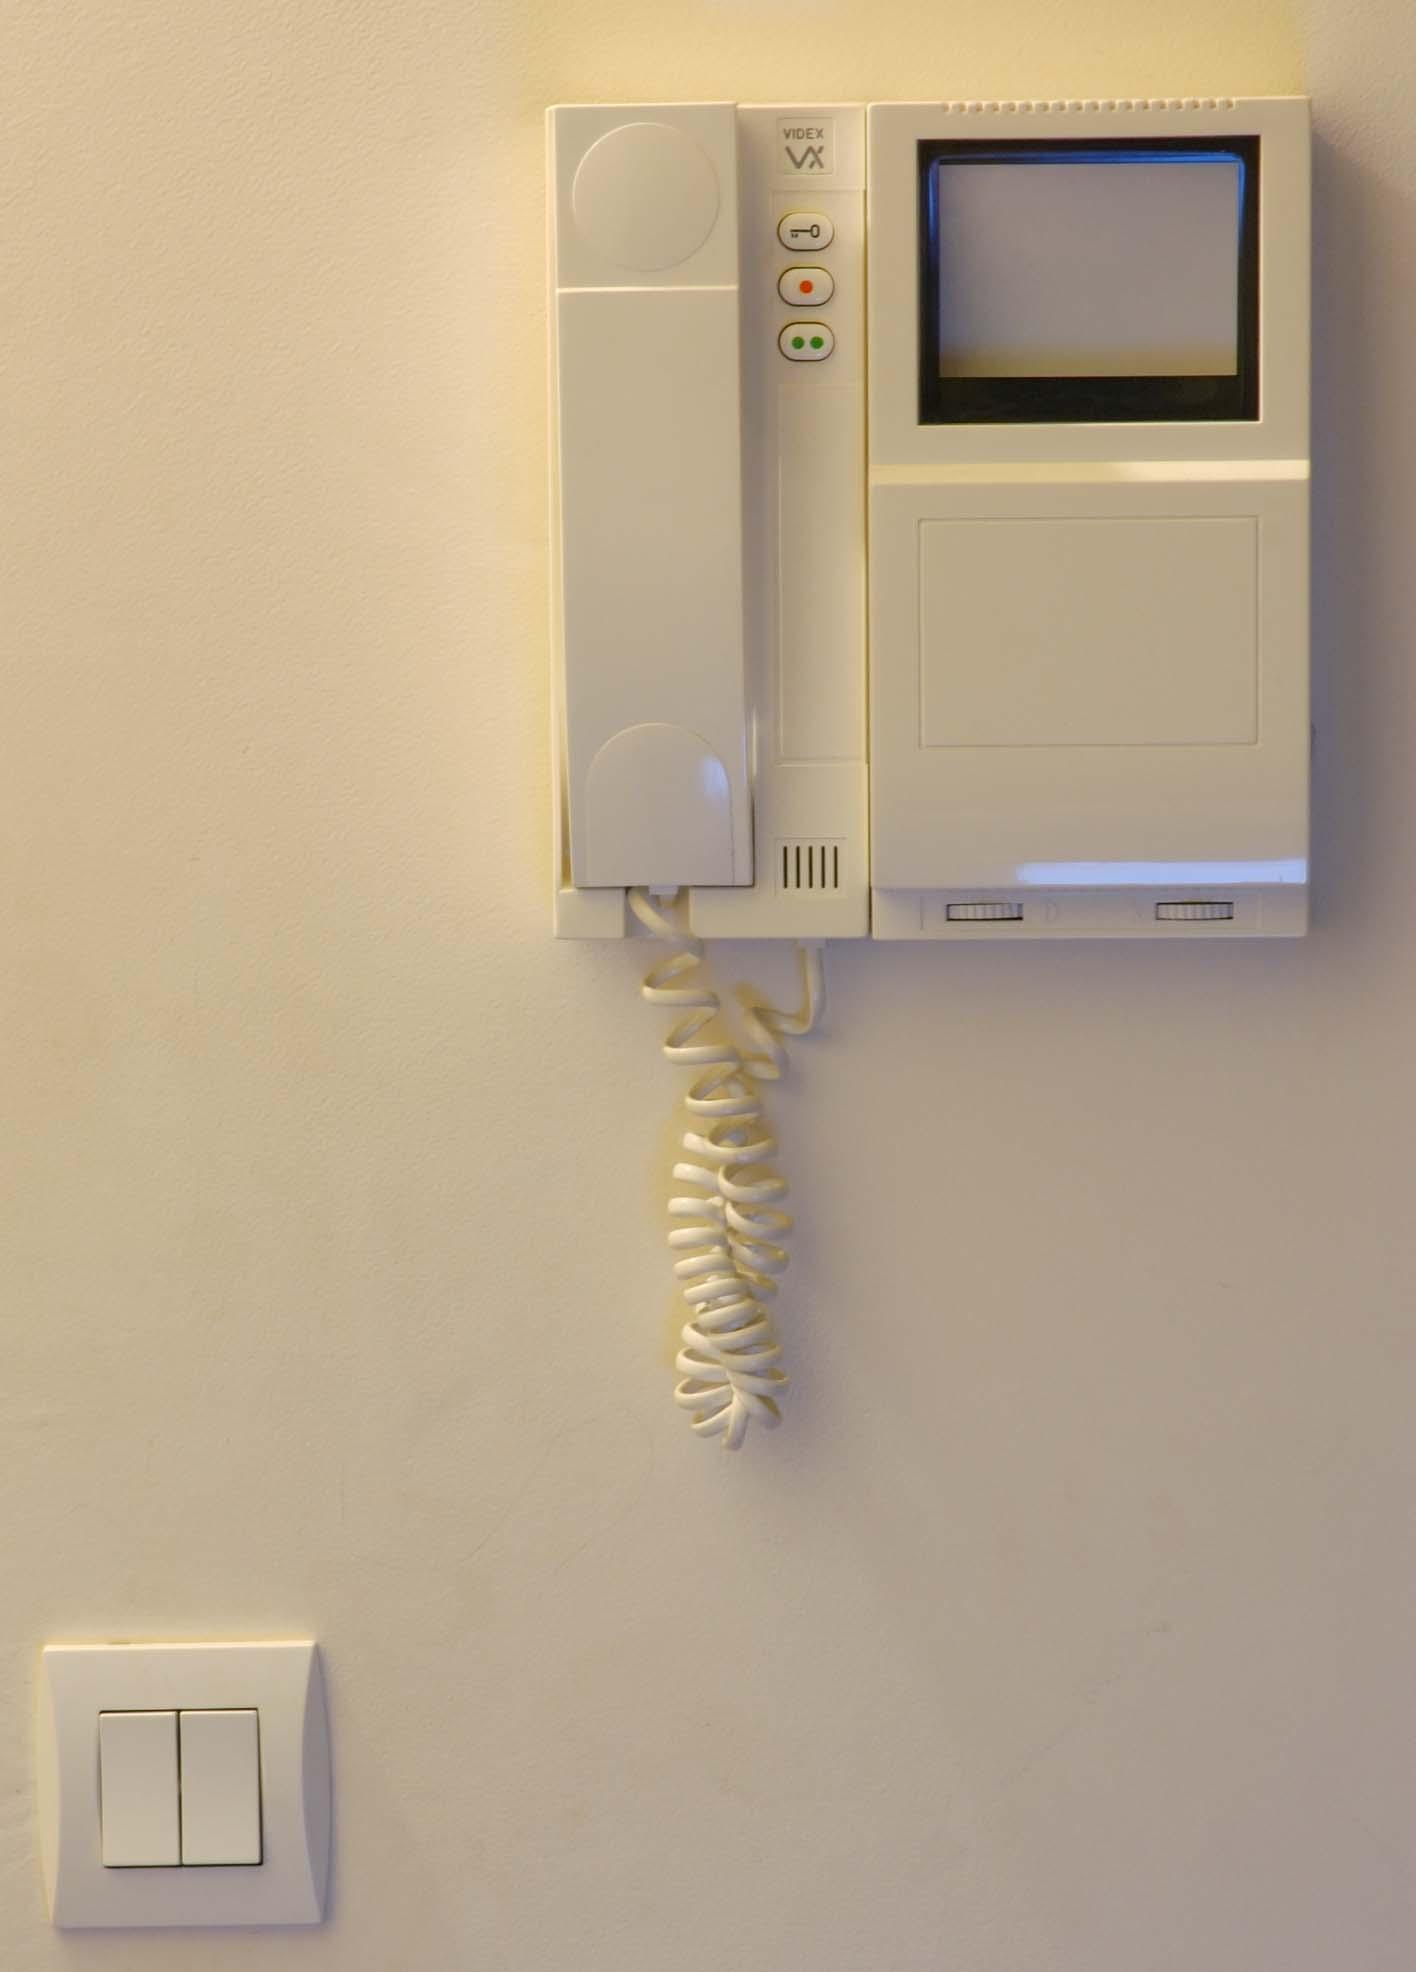 interphone wikiwand. Black Bedroom Furniture Sets. Home Design Ideas